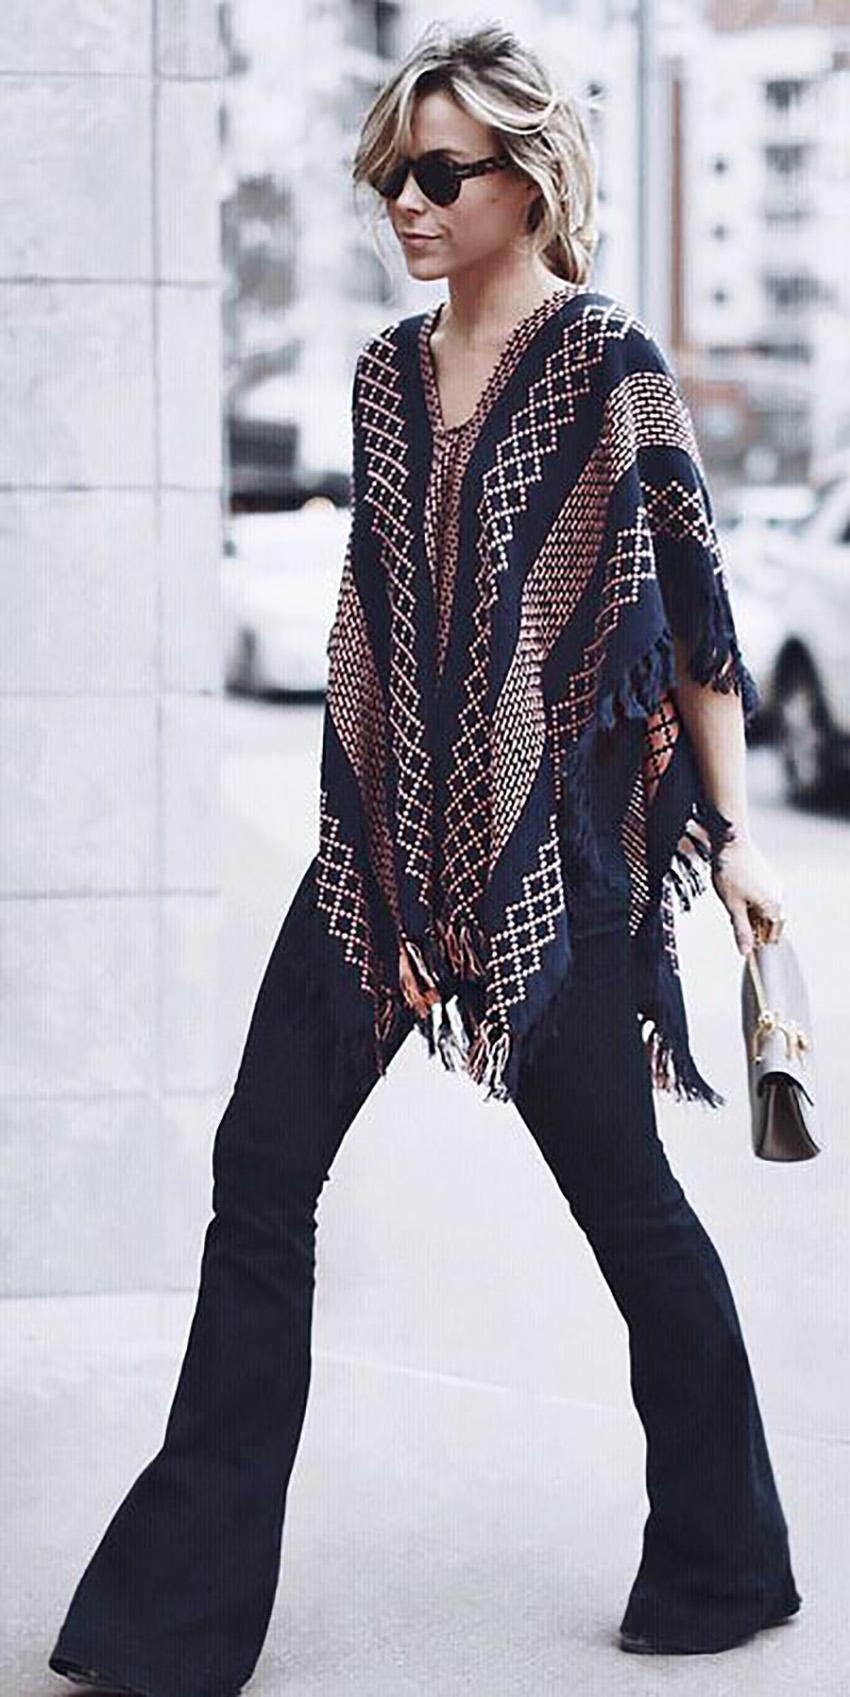 pantaloni-zampa-styleshouts-hollywood-style-flared-jeans-black-color-mantella